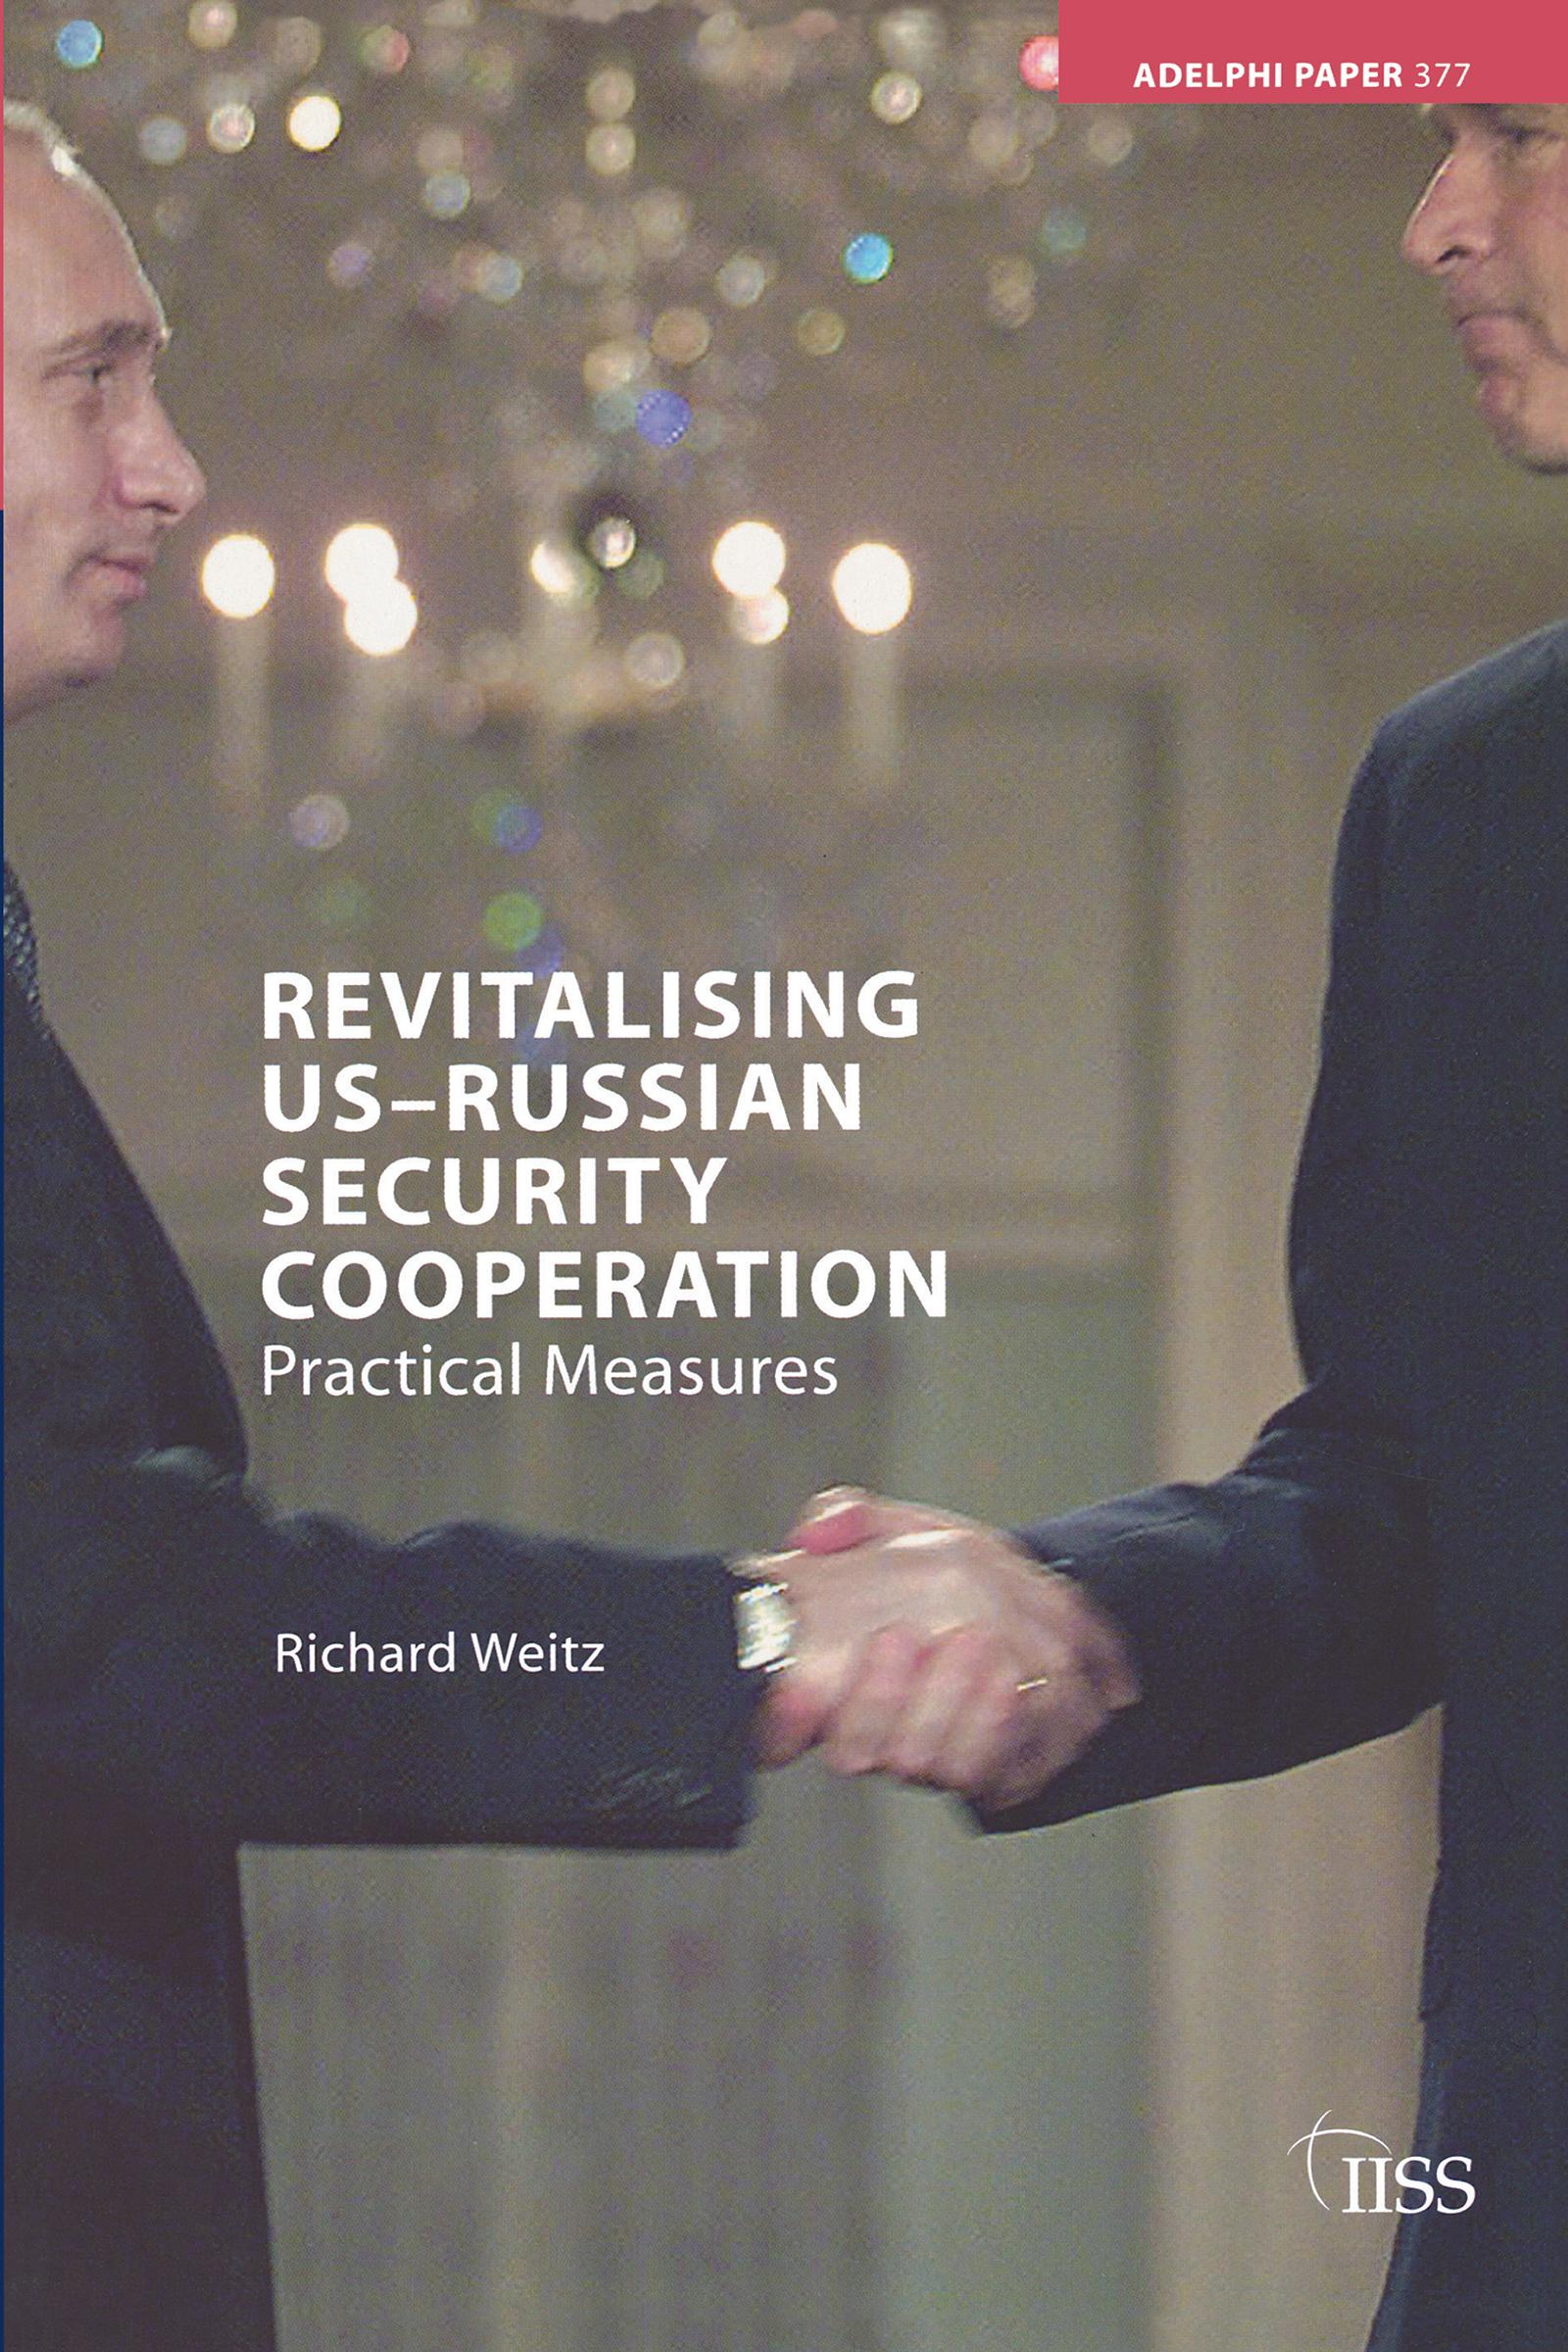 Revitalising US-Russian Security Cooperation